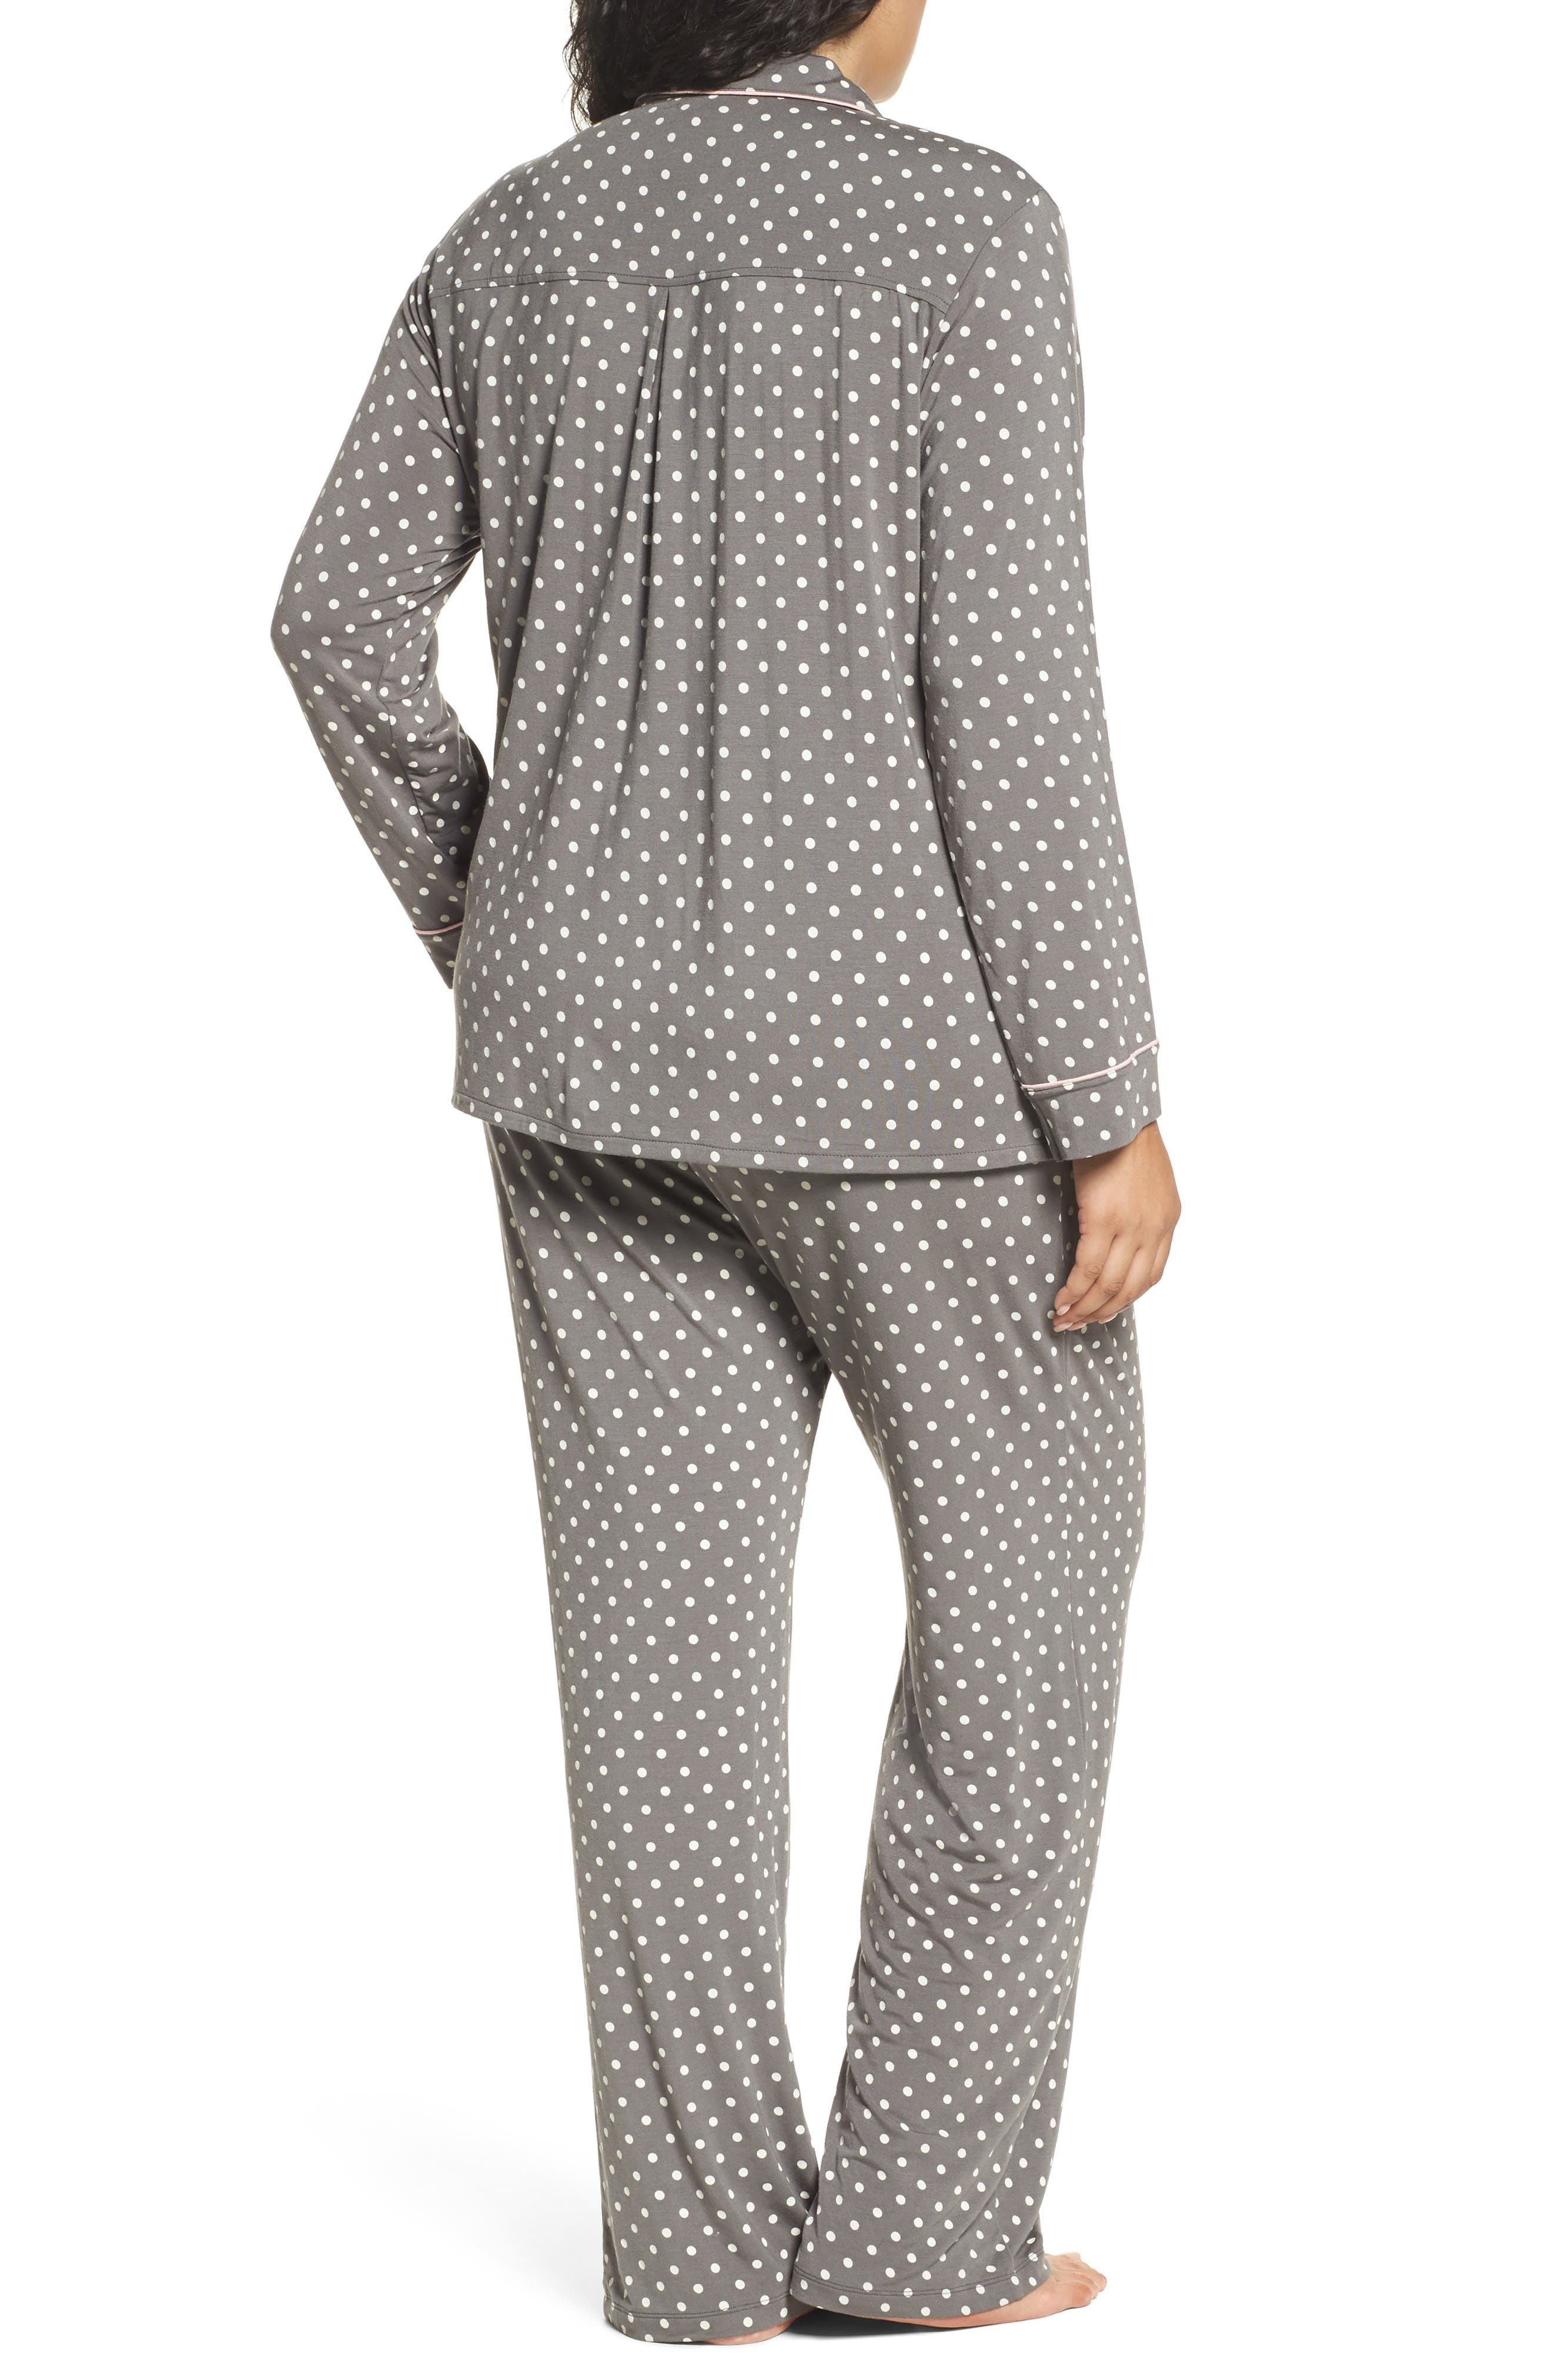 Polka Dot Pajamas,                             Alternate thumbnail 2, color,                             Charcoal